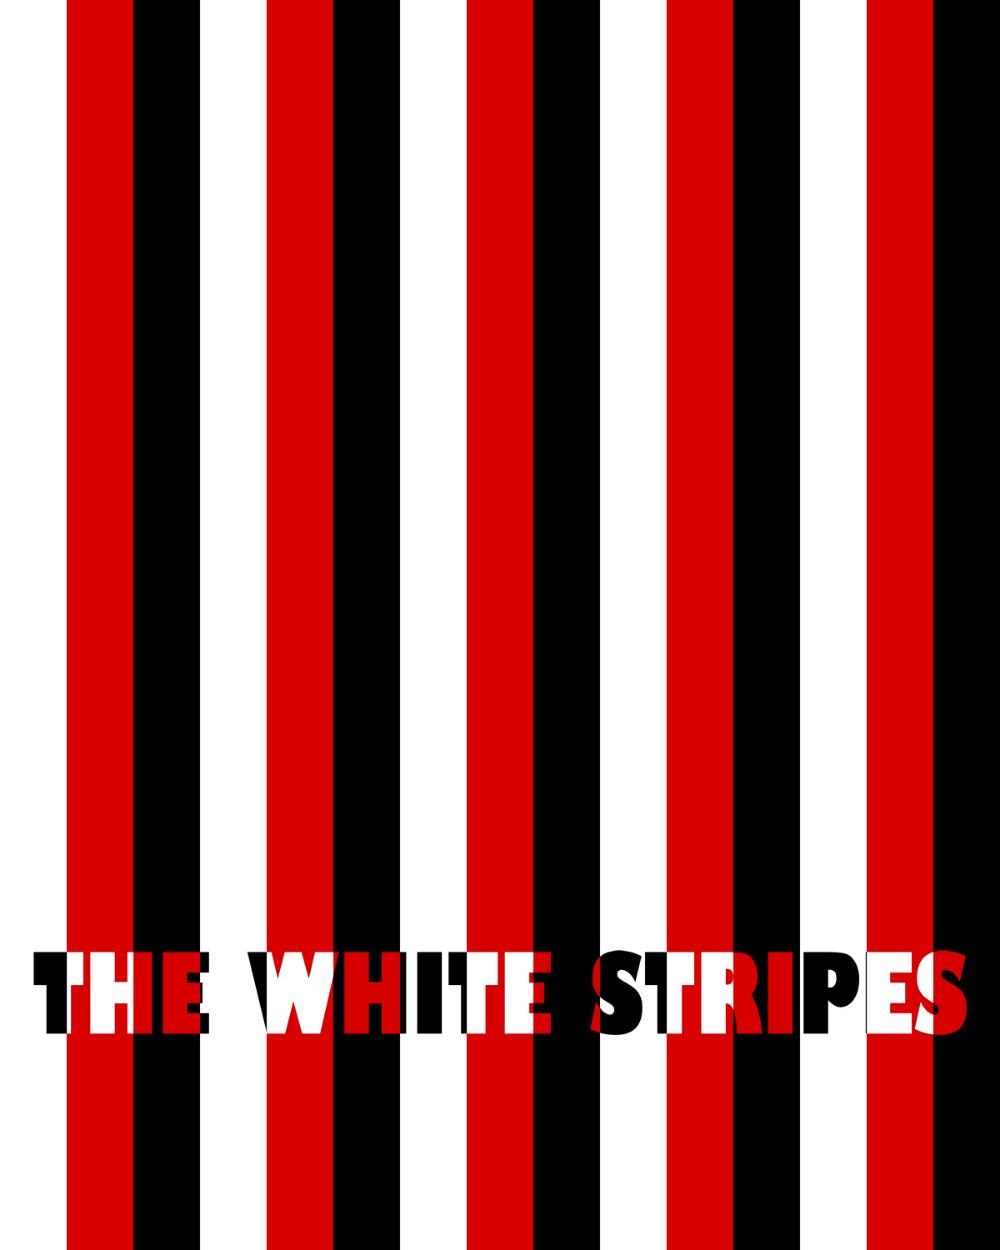 I Made A White Stripes Poster Jackwhite White Stripe Stripes The White Stripes